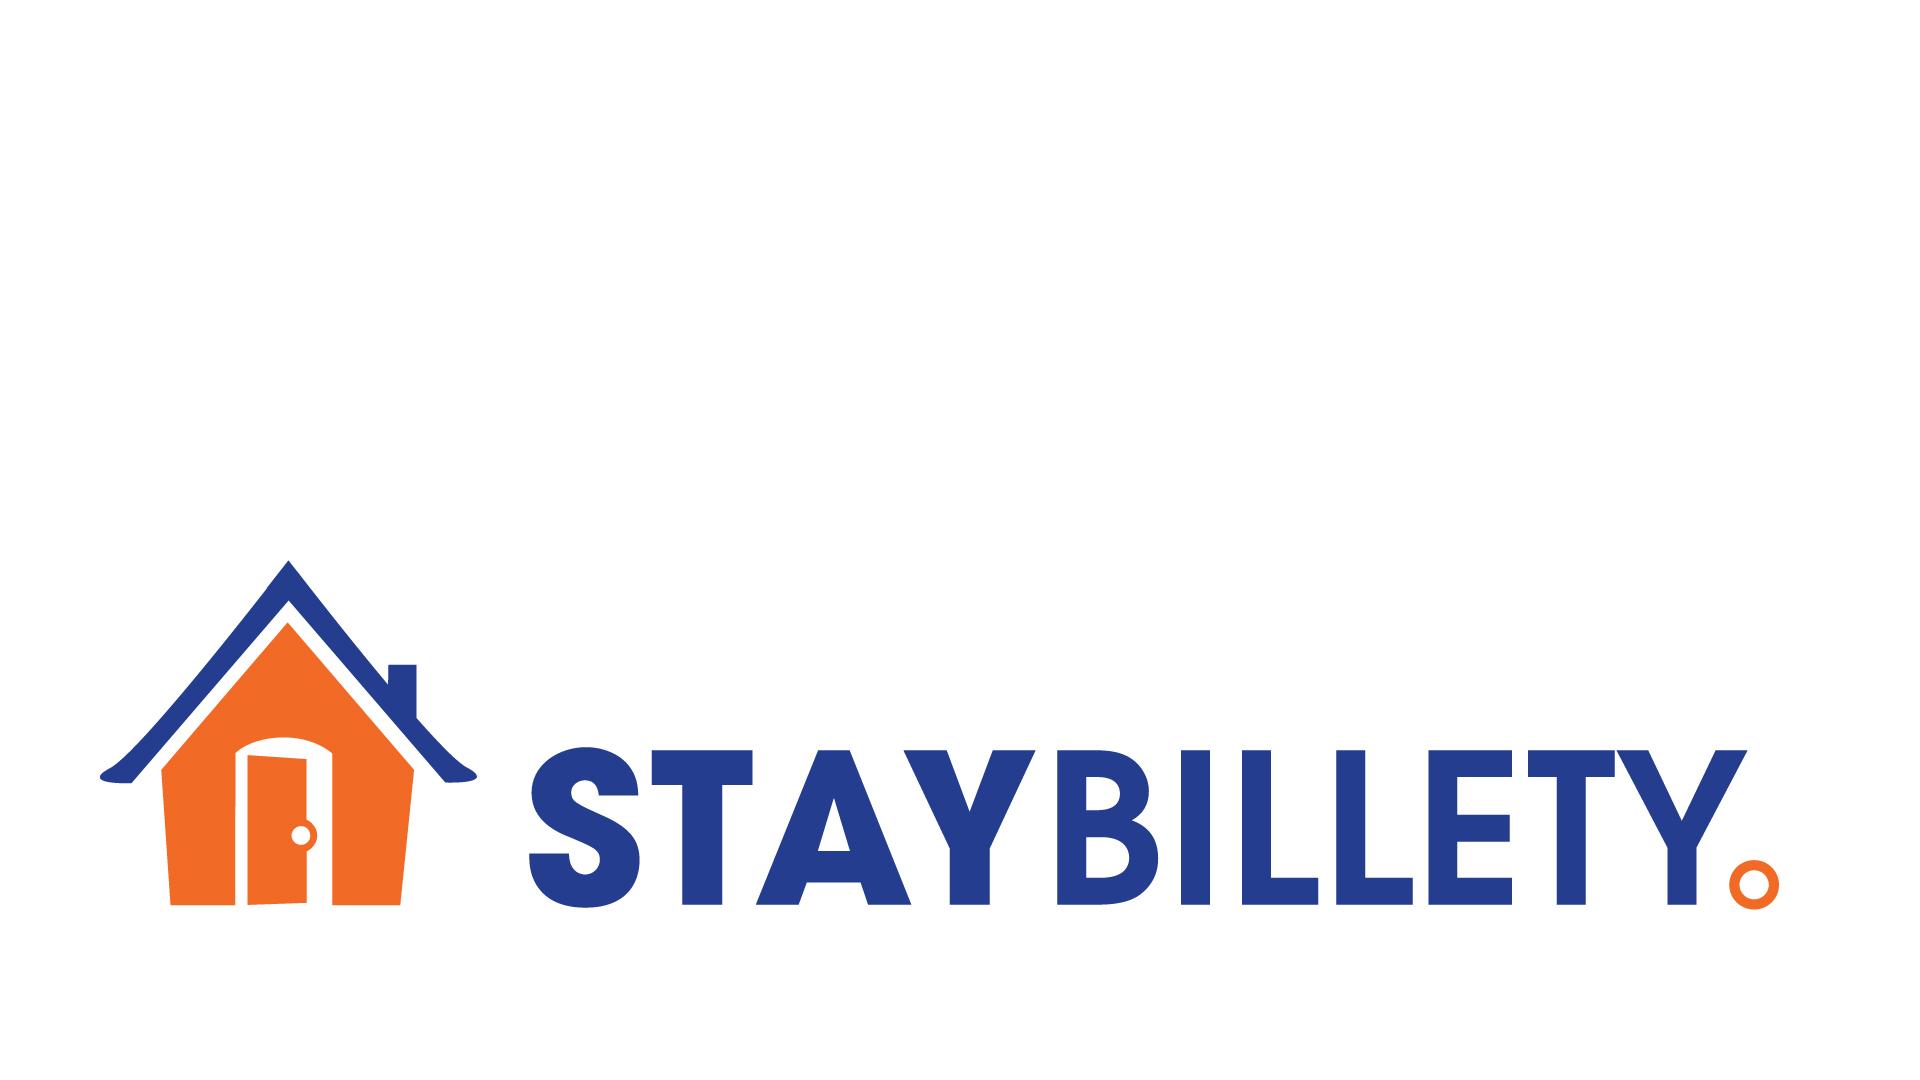 staybillety